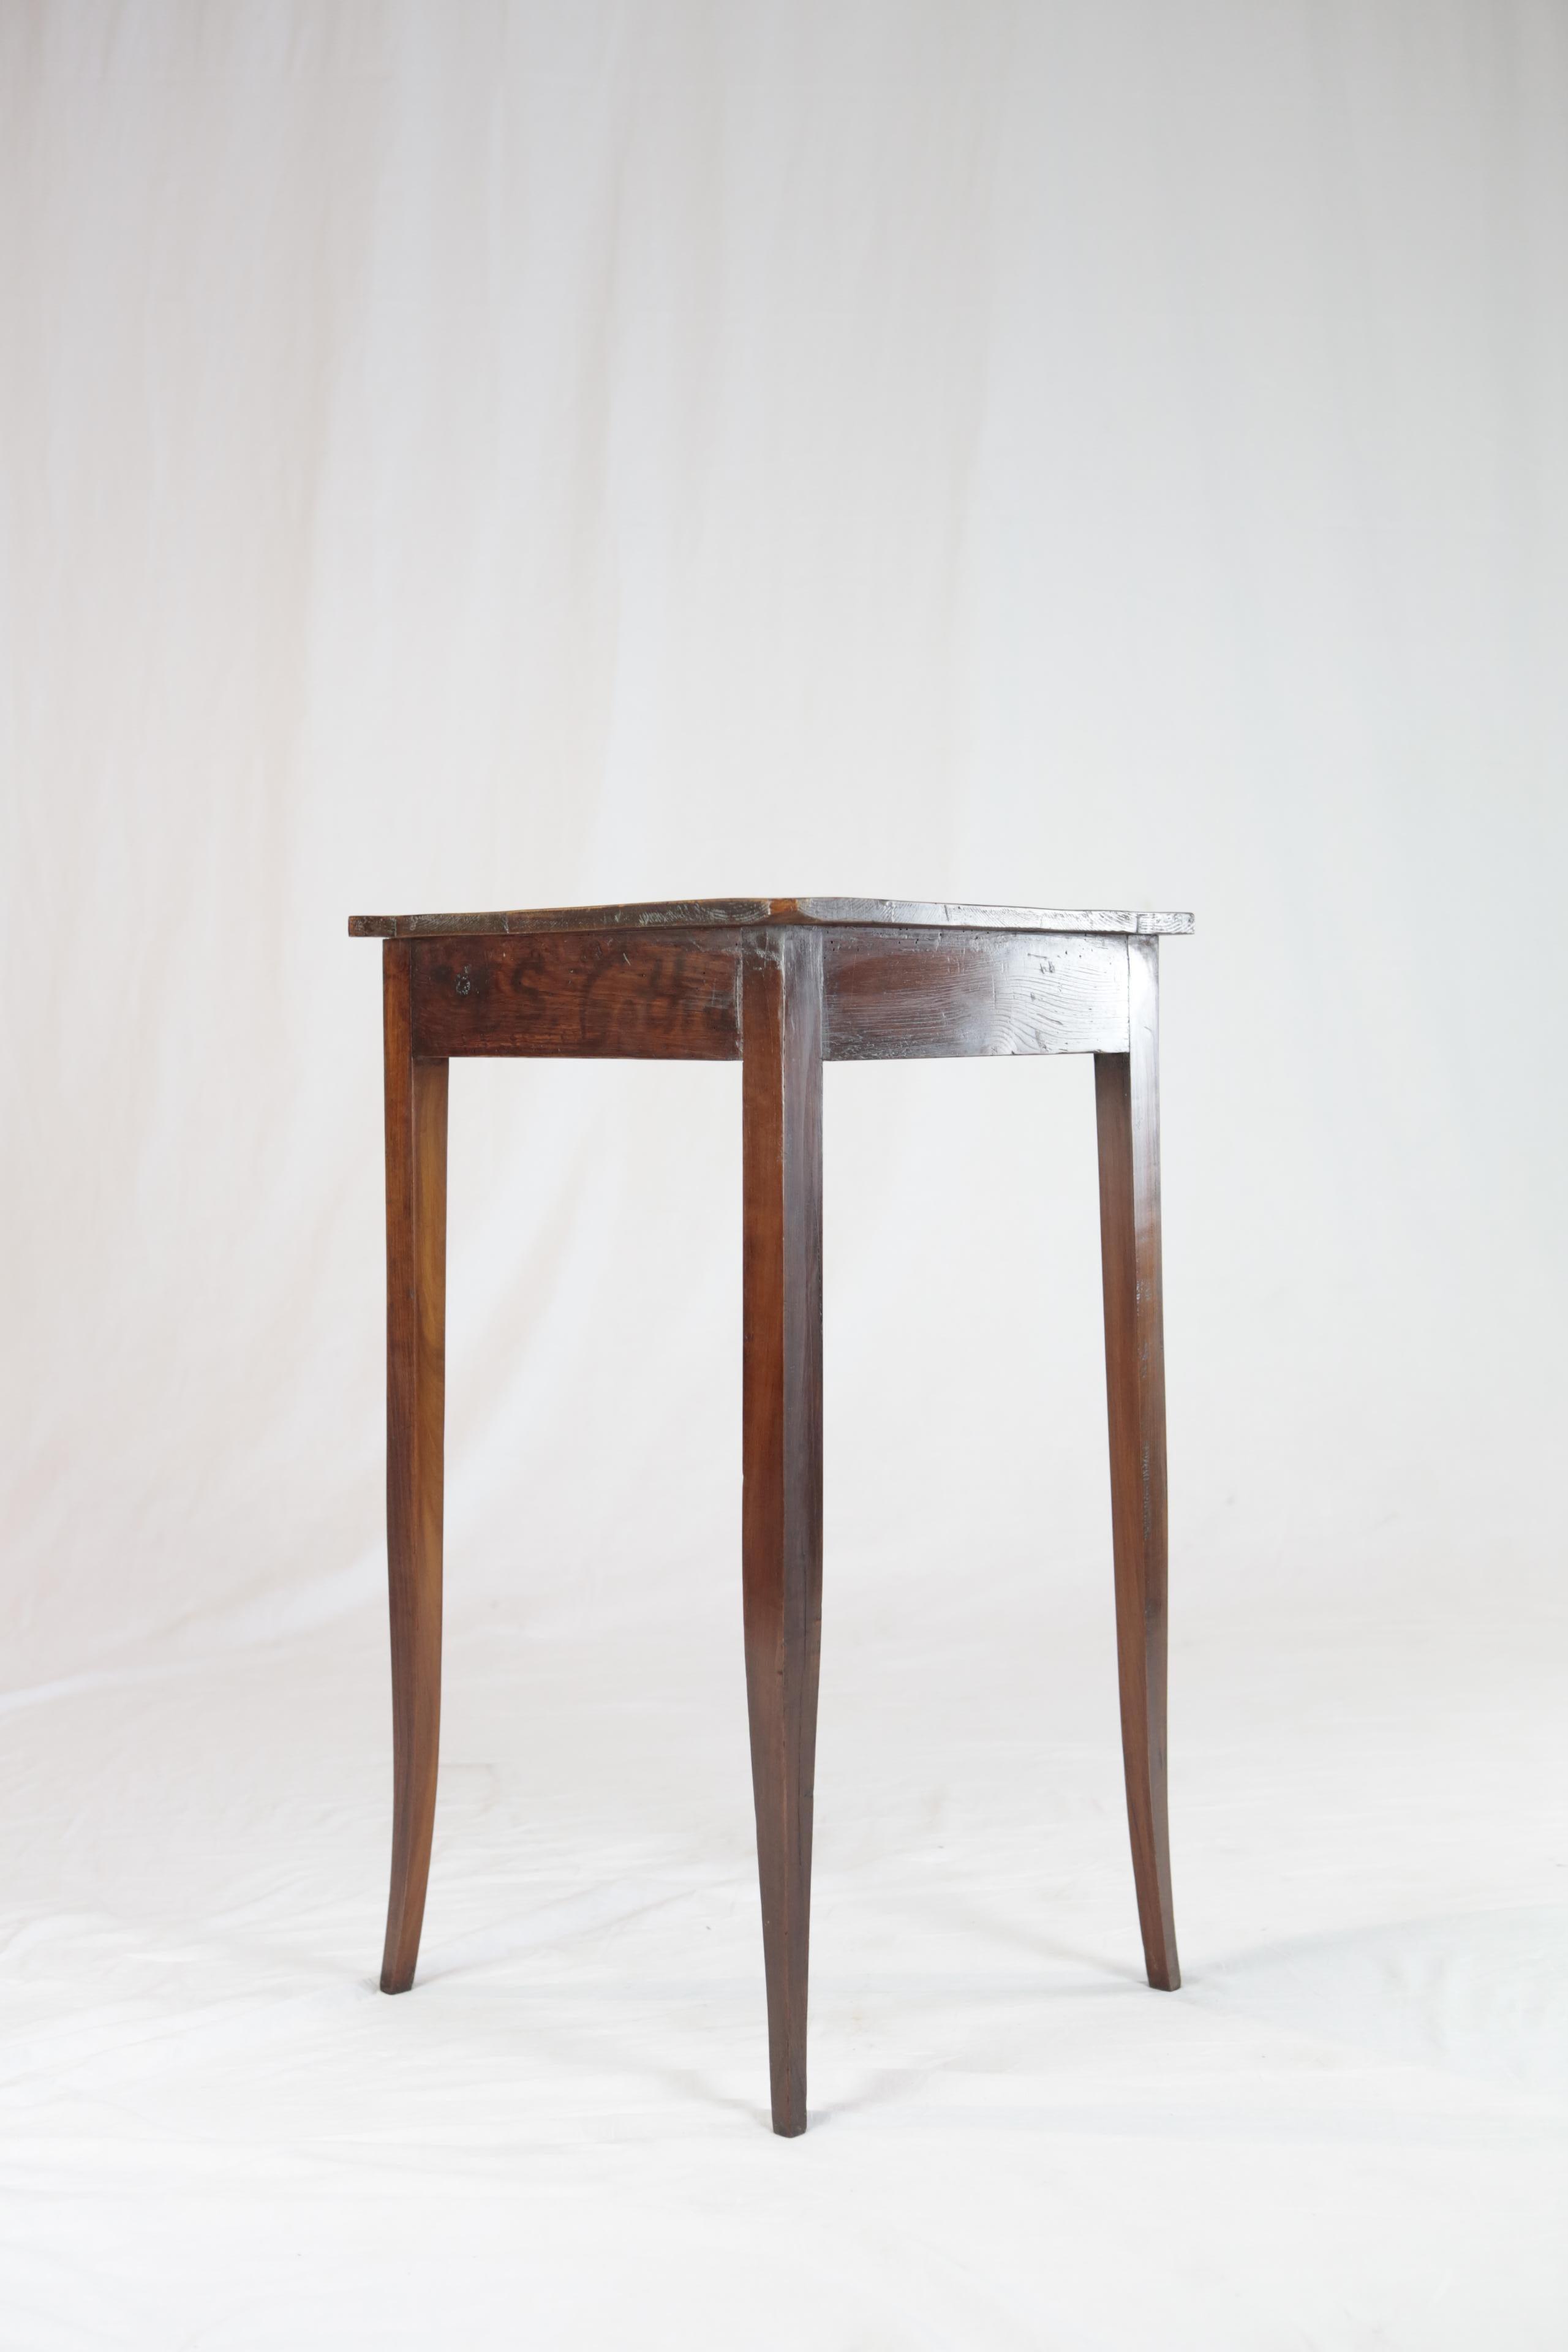 Superieur Small Biedermeier Corner Table, Mahogany Veneer, Germany, Circa 1820 1830  In Good